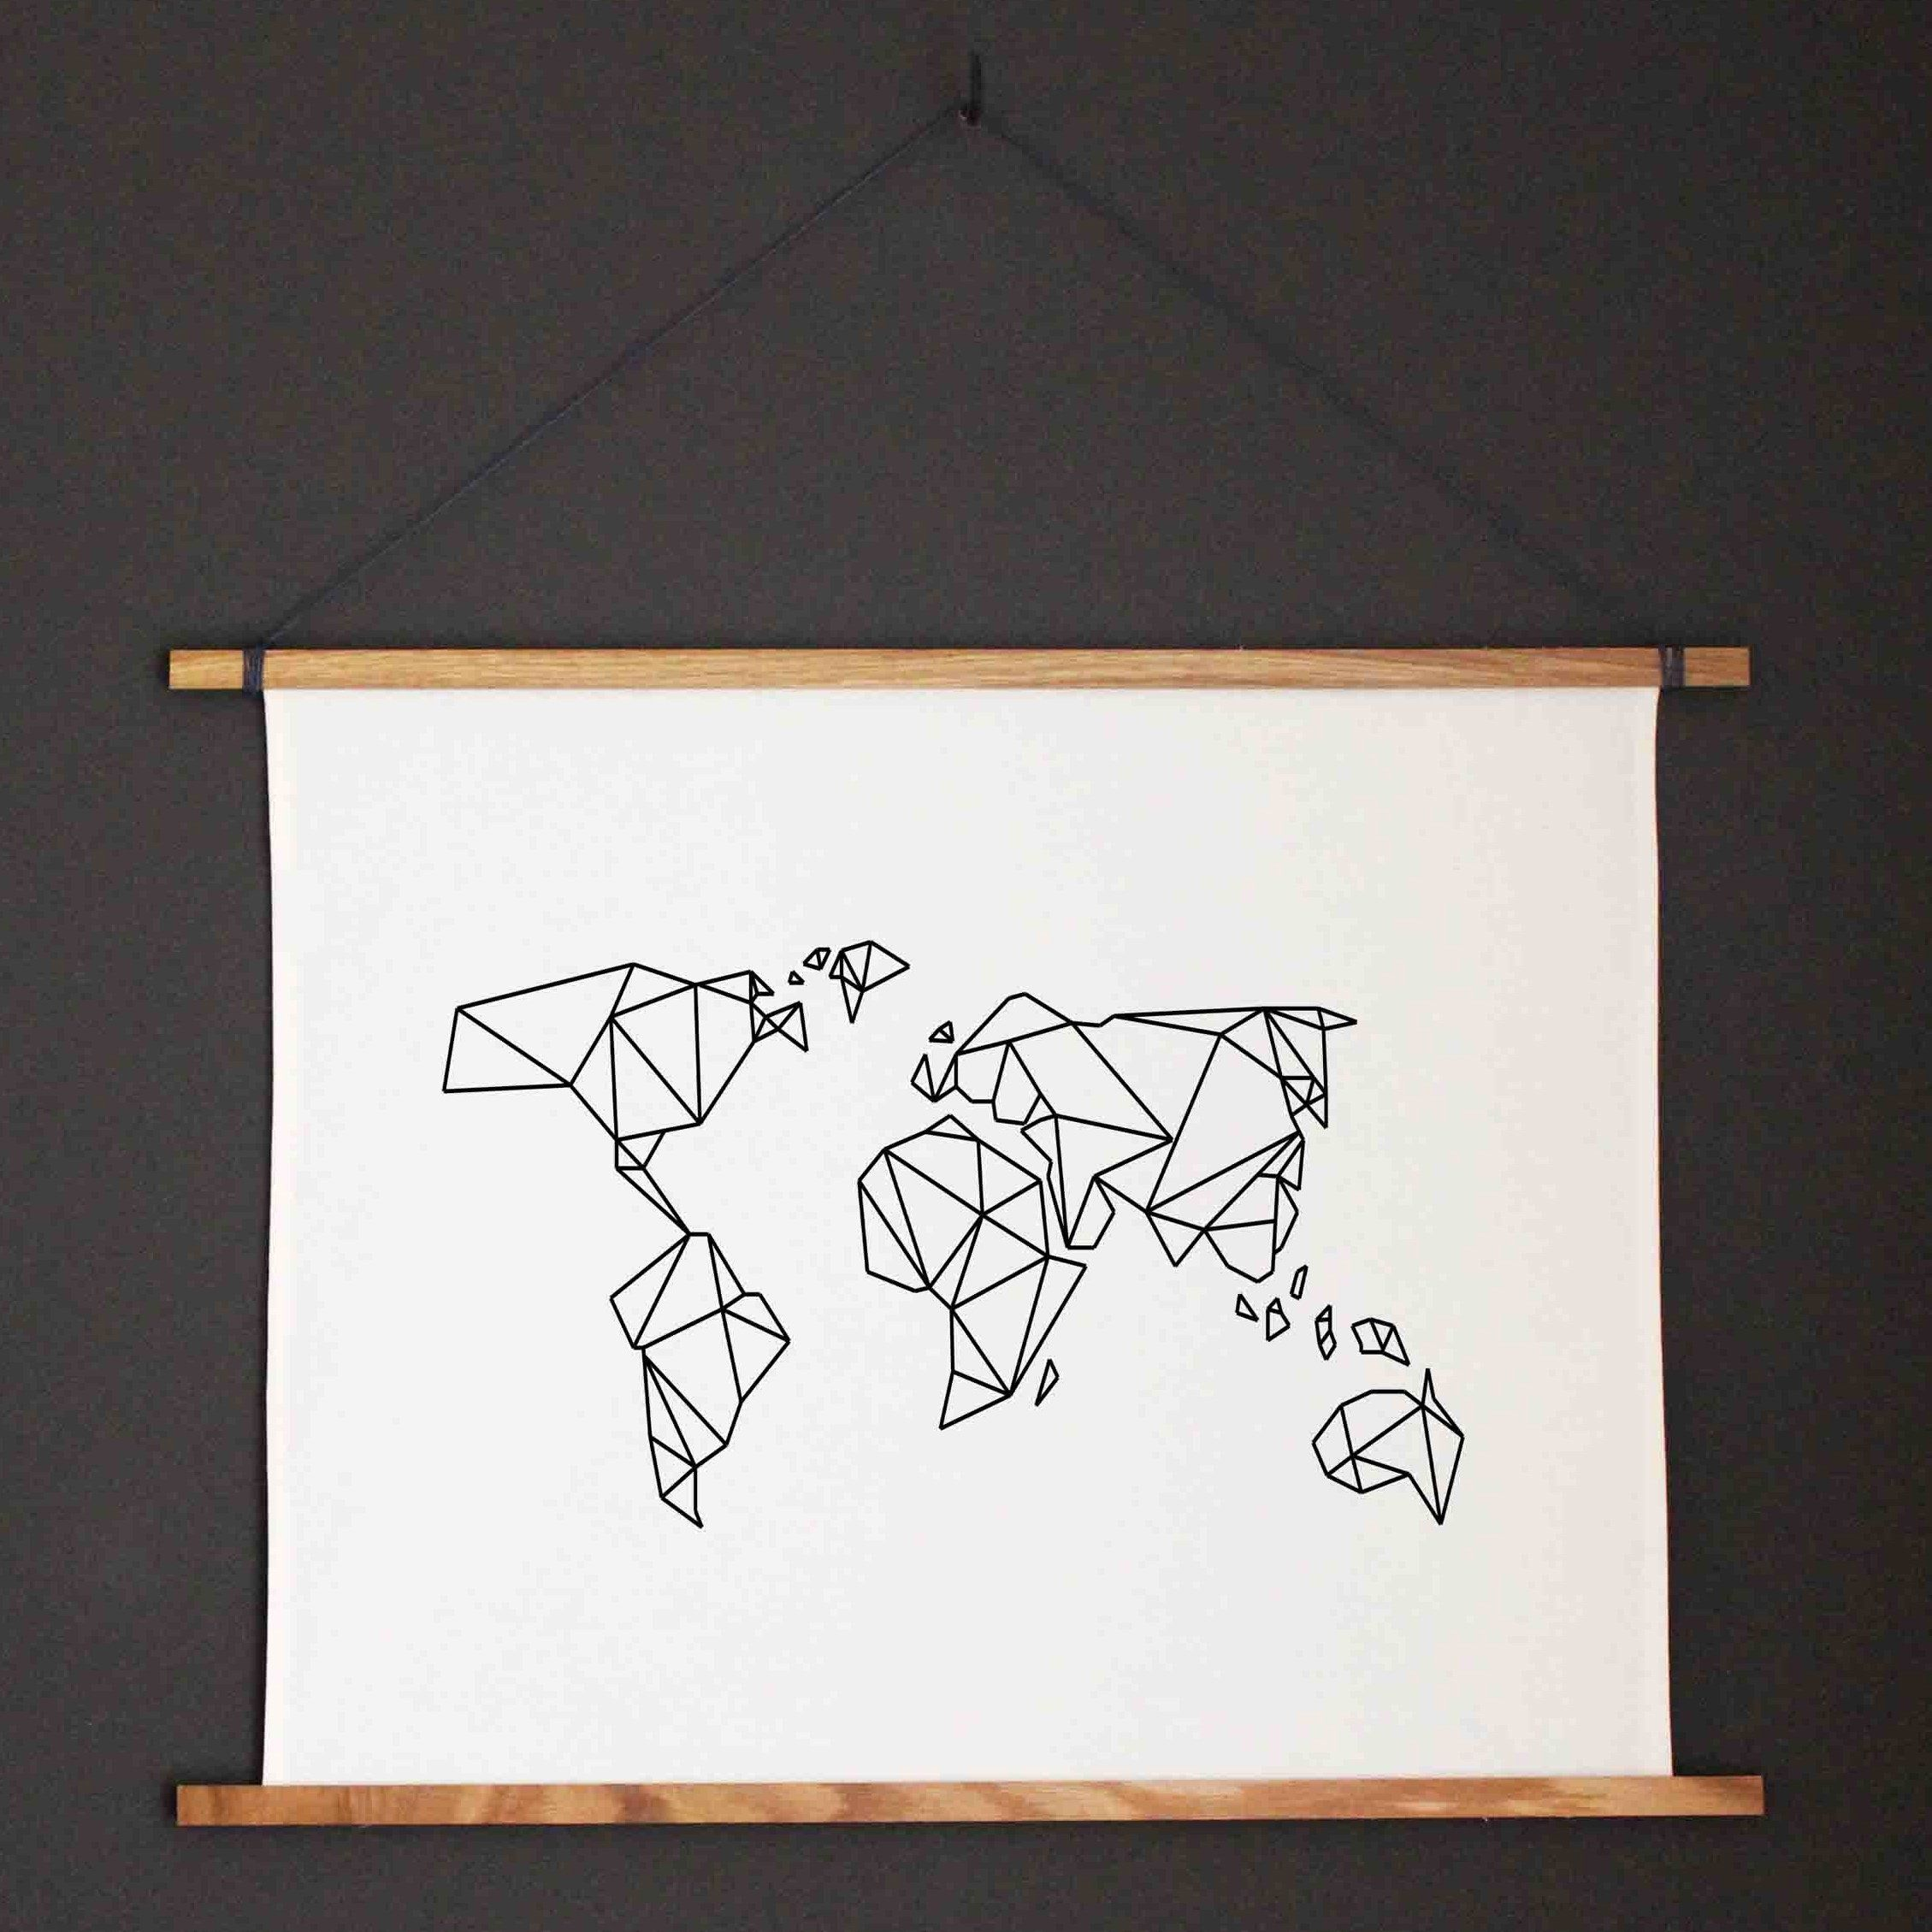 Kunstdruck weltkarte mit holzleiste poster aus stoff mit for Weltkarte leinwand ikea